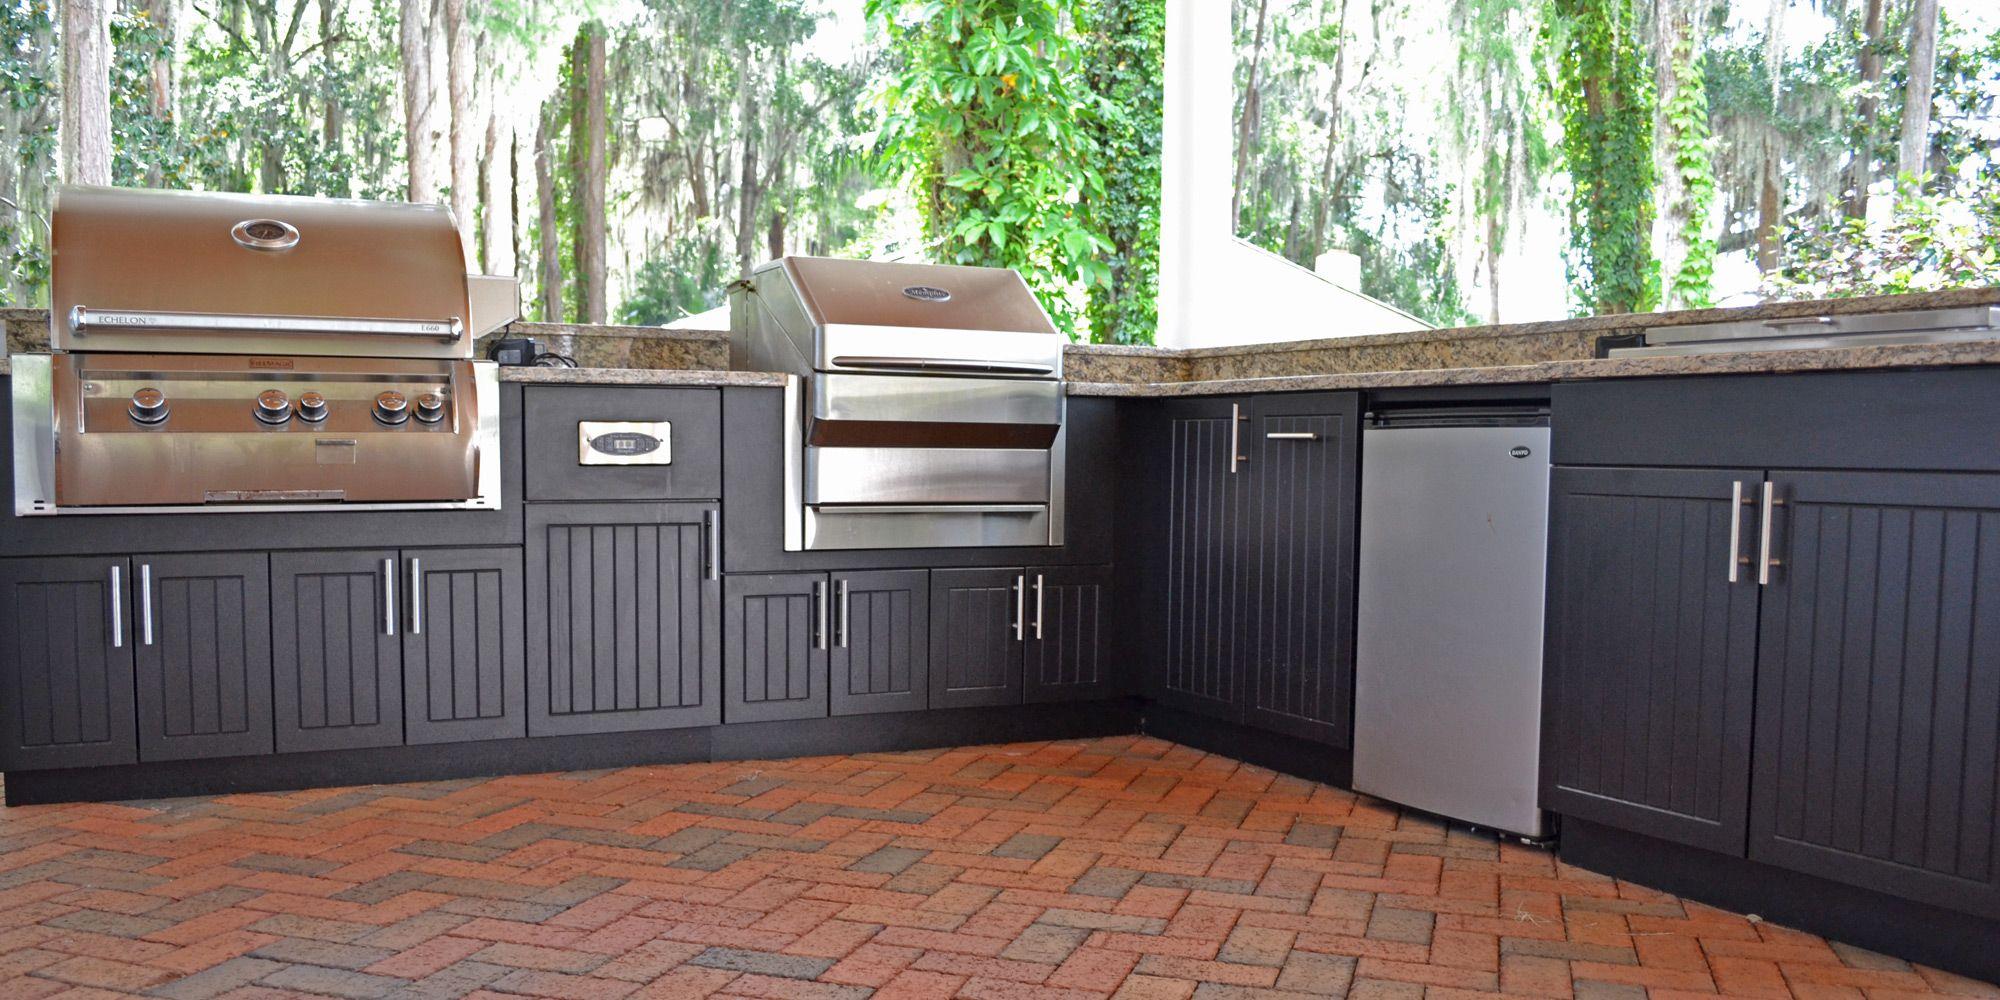 Https Www Daniellefence Com Image 20library Photo 20gallery Outdoor 20kitchens Premium Polymer Outdoor Kitchen In 2020 Black Kitchens Outdoor Kitchen Outdoor Storage